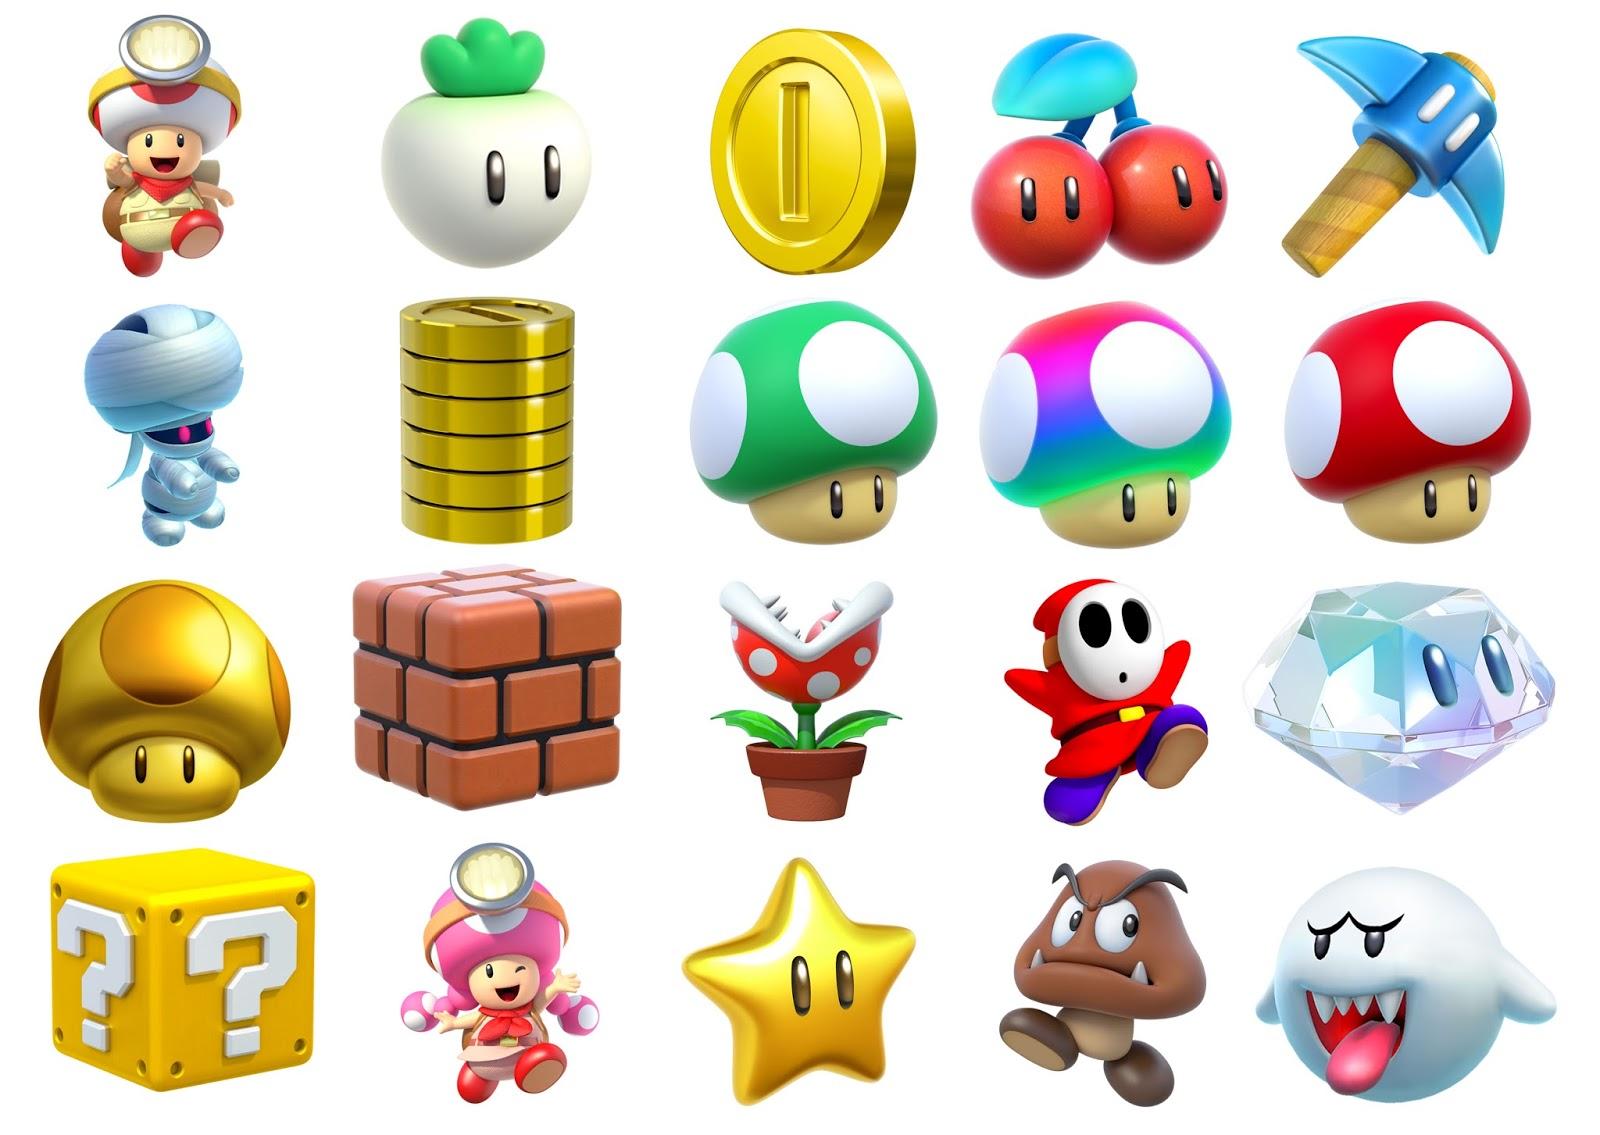 My Super Mario Boy Super Mario Scavenger Hunt with Downloads